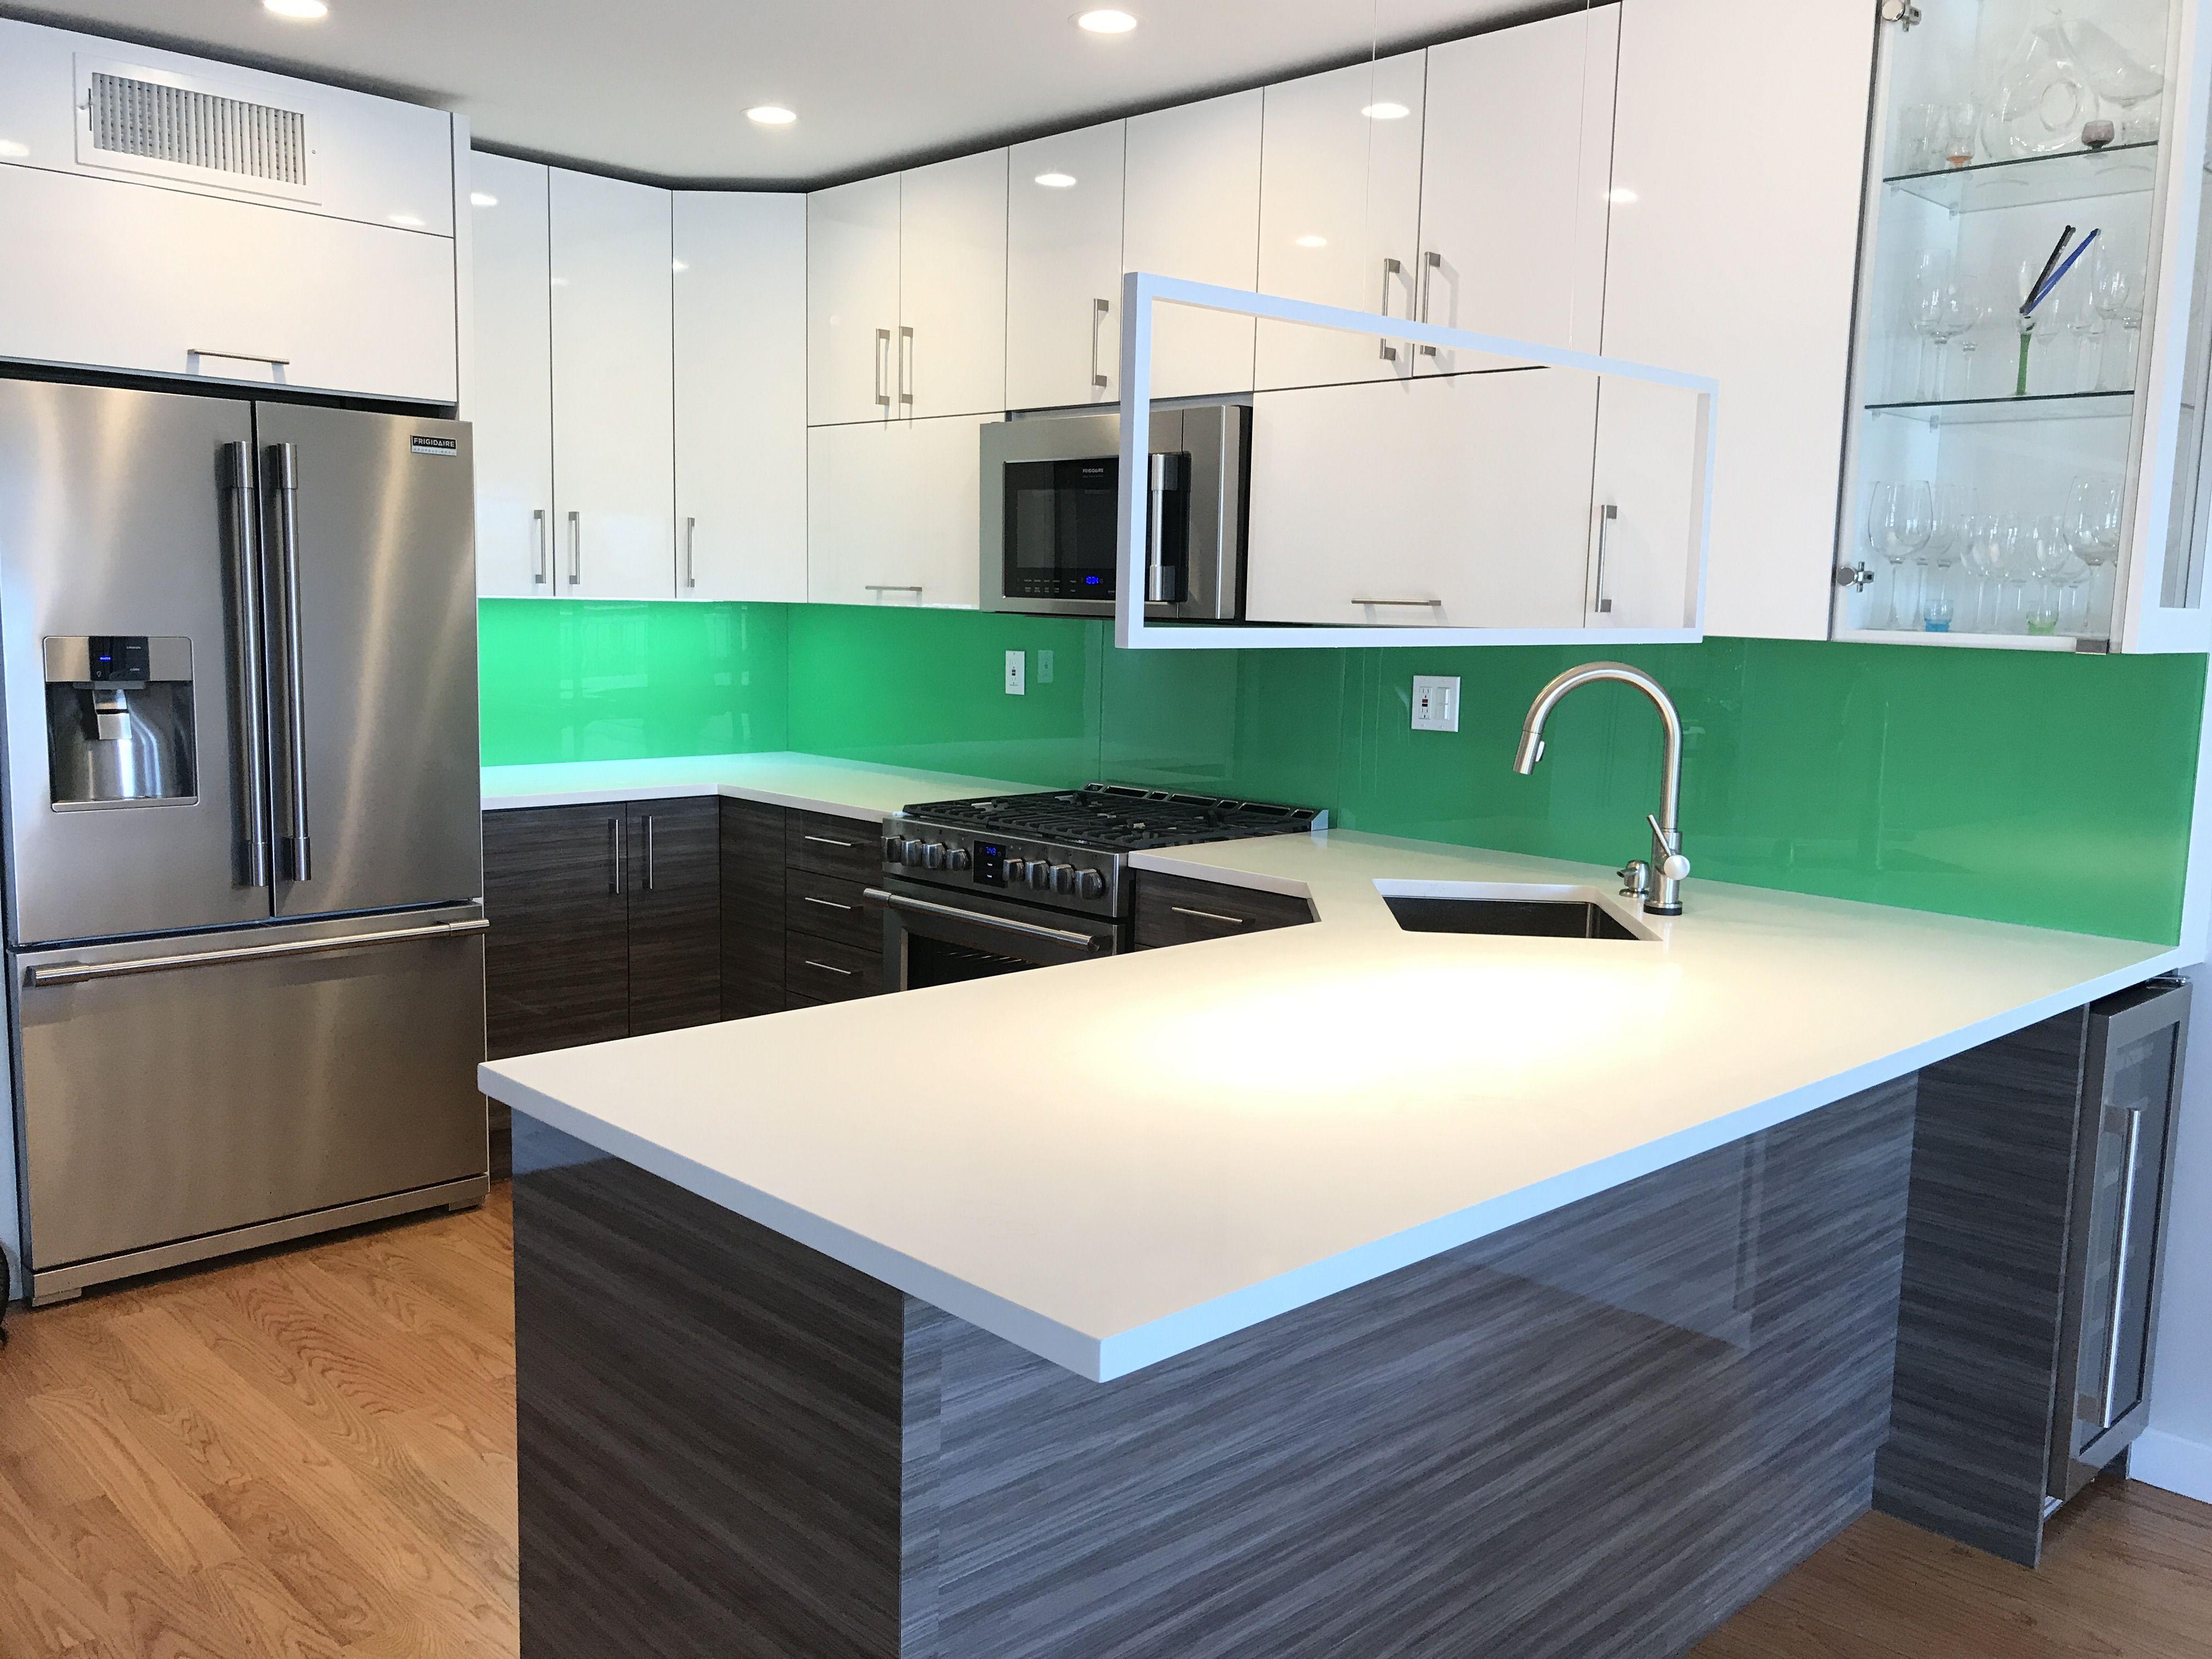 Solid Color Kitchen Backsplash Using 1 4 Starphire Tempered Glass Kitchen Colors Kitchen Glass Backsplash